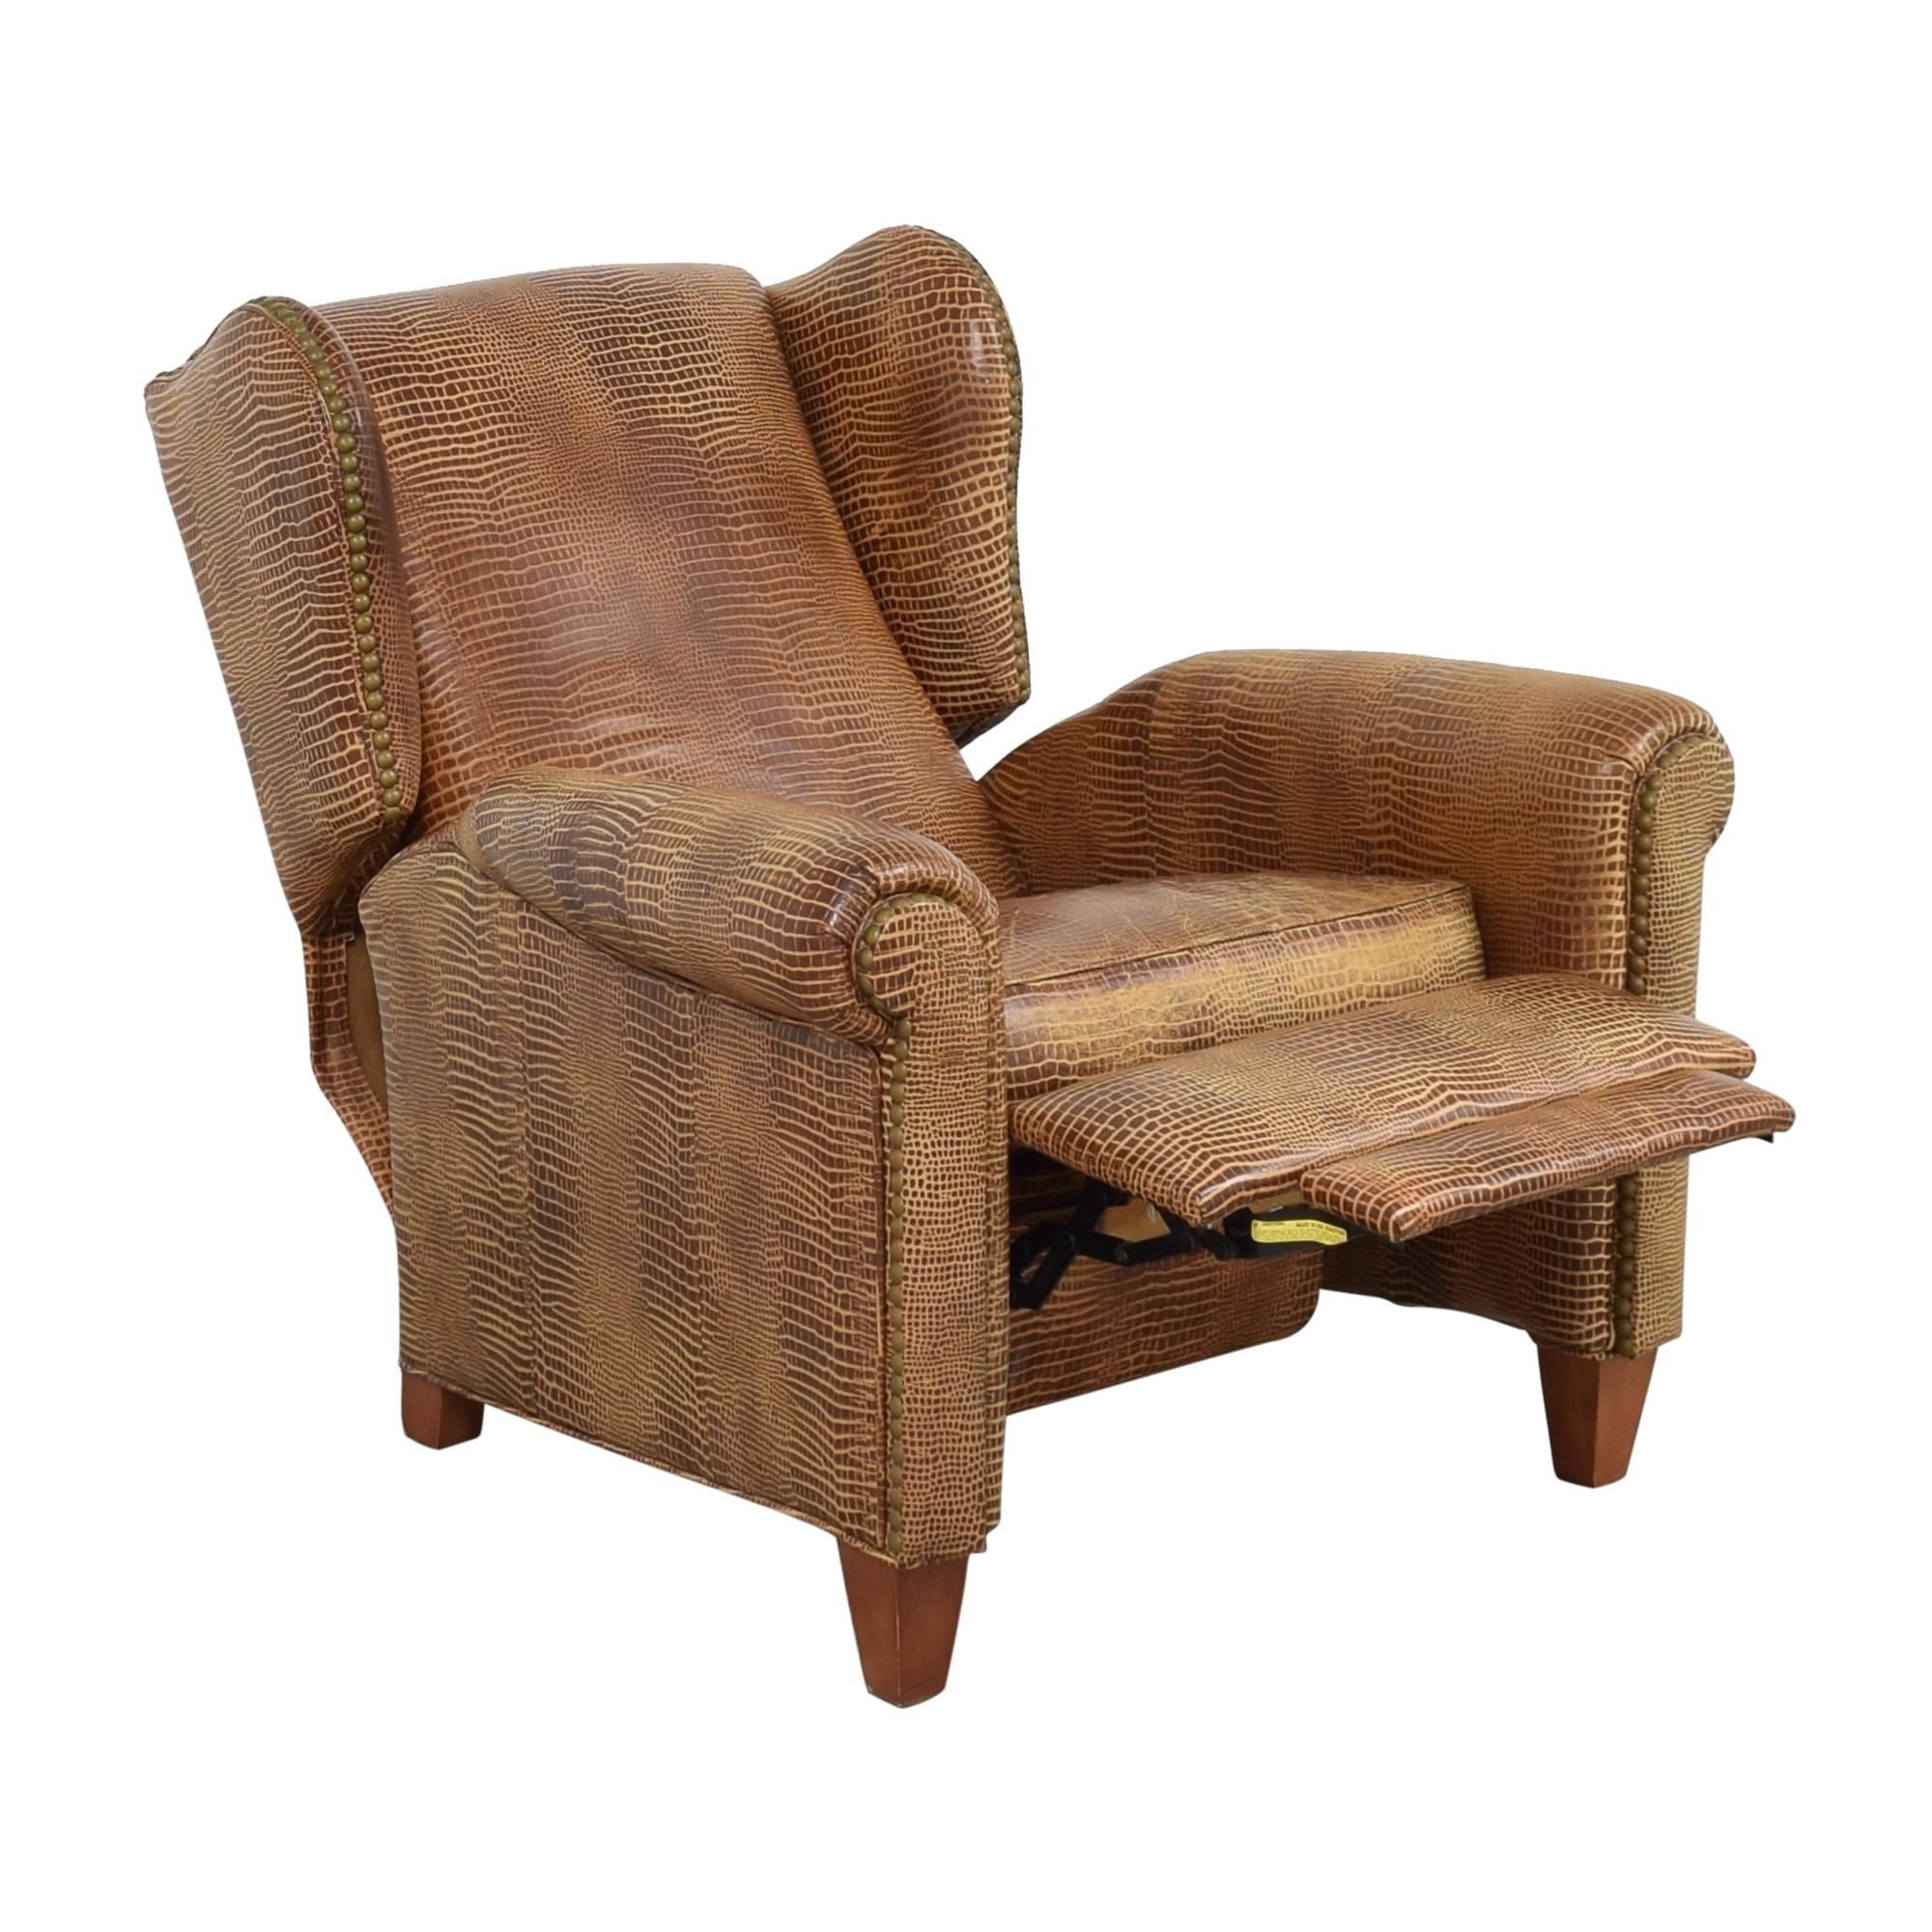 Ethan Allen Ethan Allen Studded Wingback Recliner Chairs